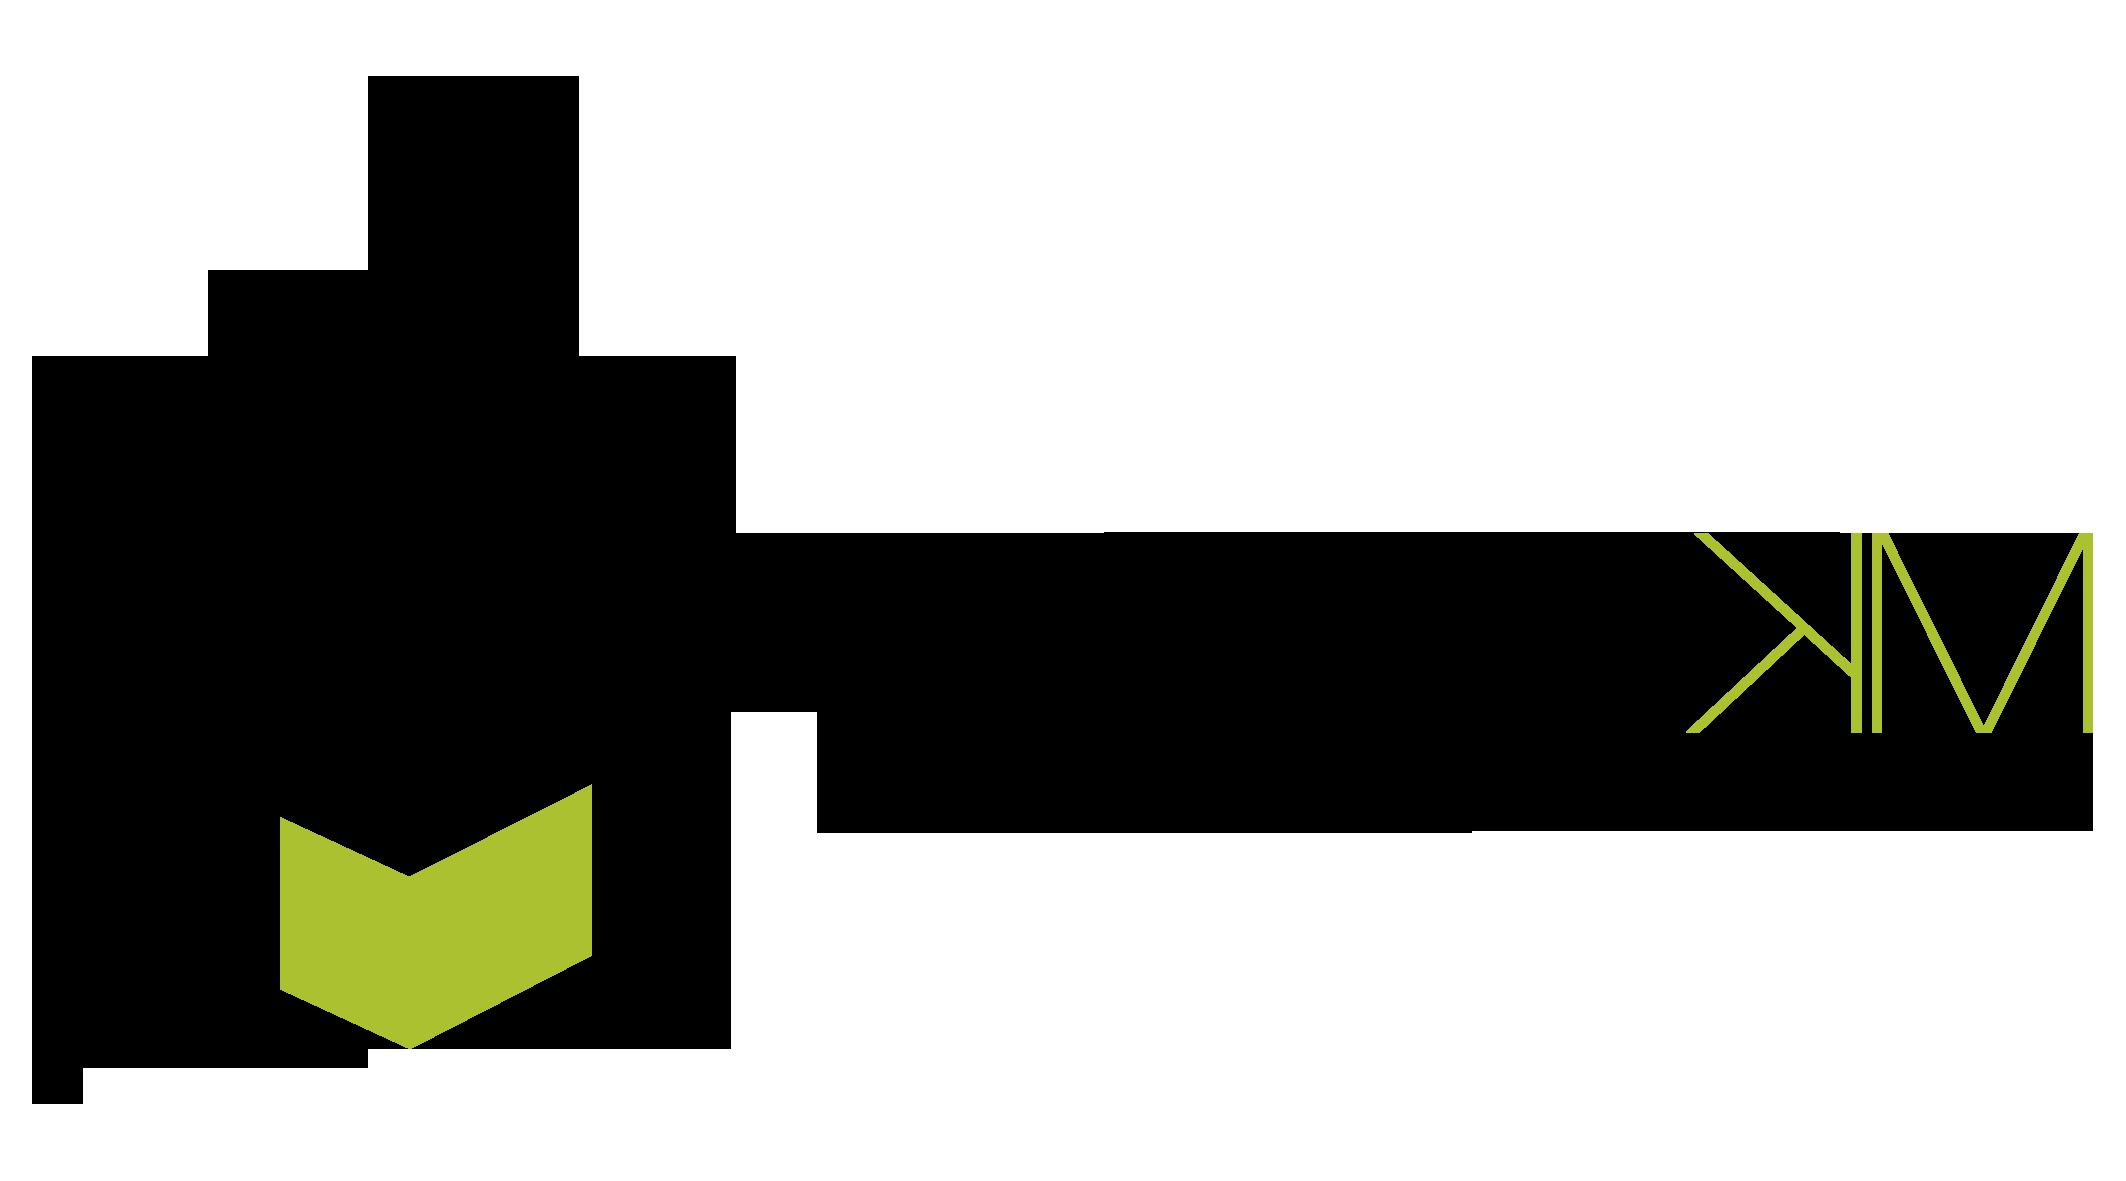 Logotipo de KassioKM